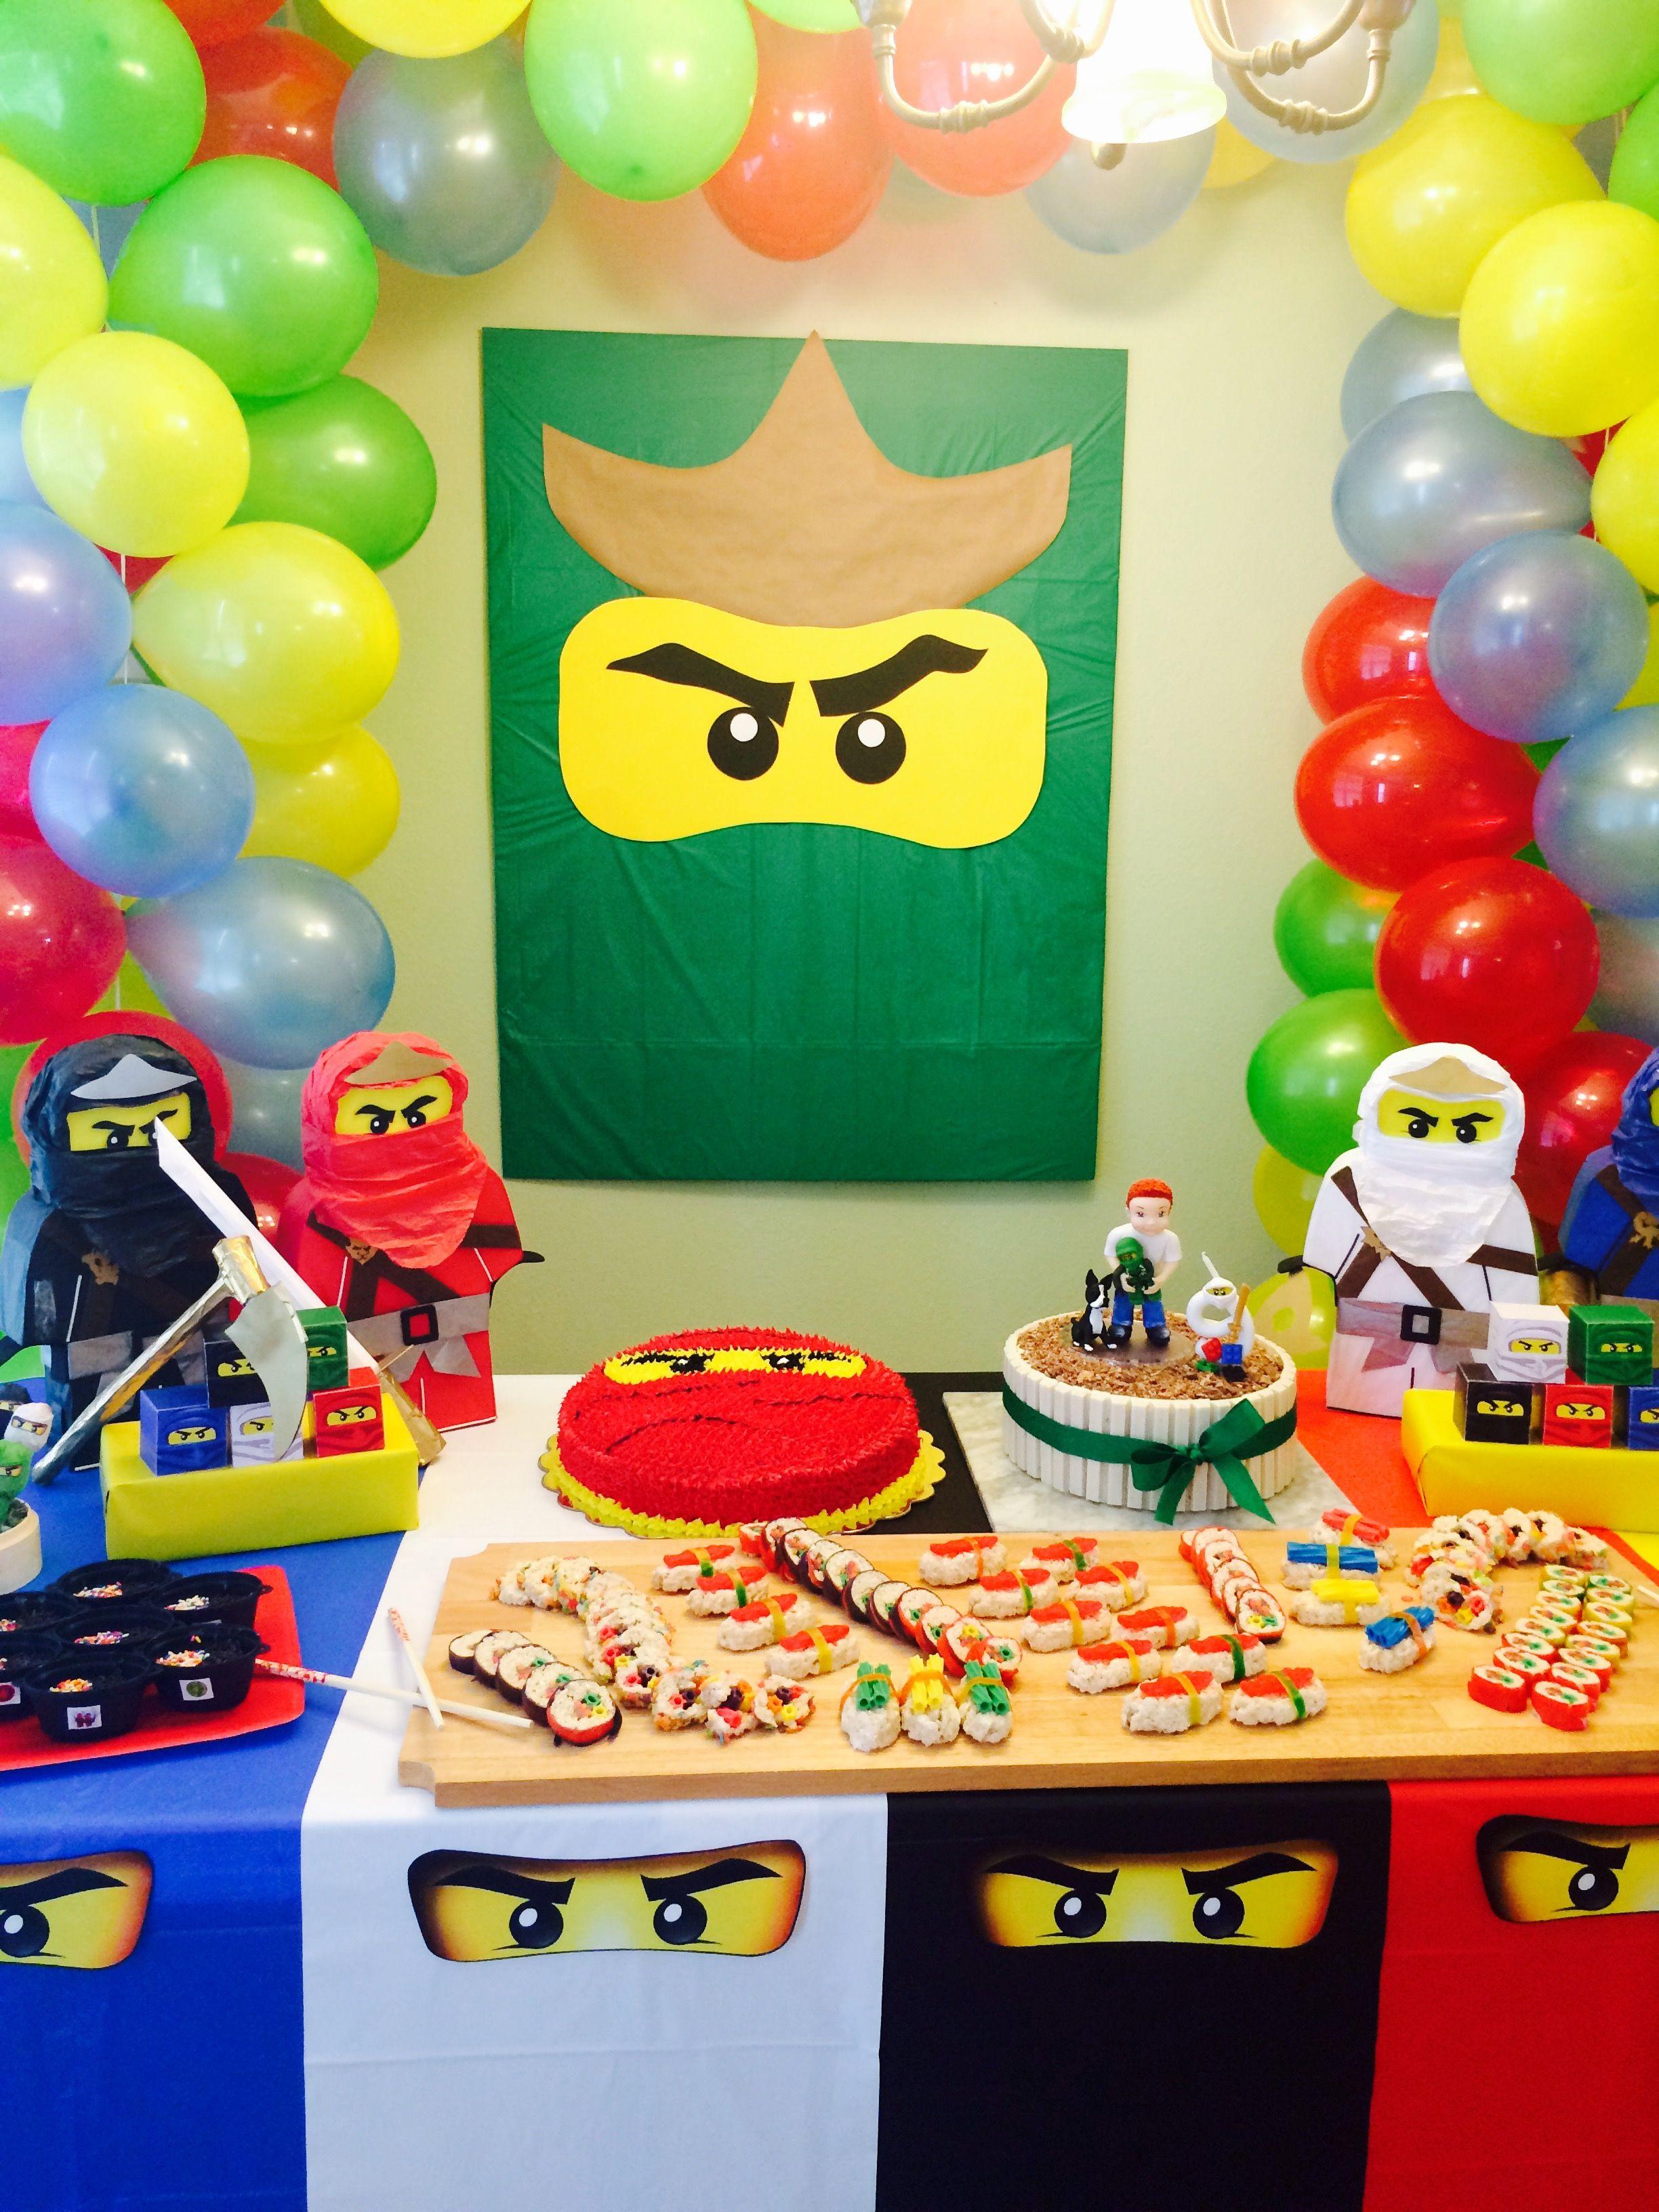 Ninjago Birthday Party Lego Birthday Party Fun Birthday Party